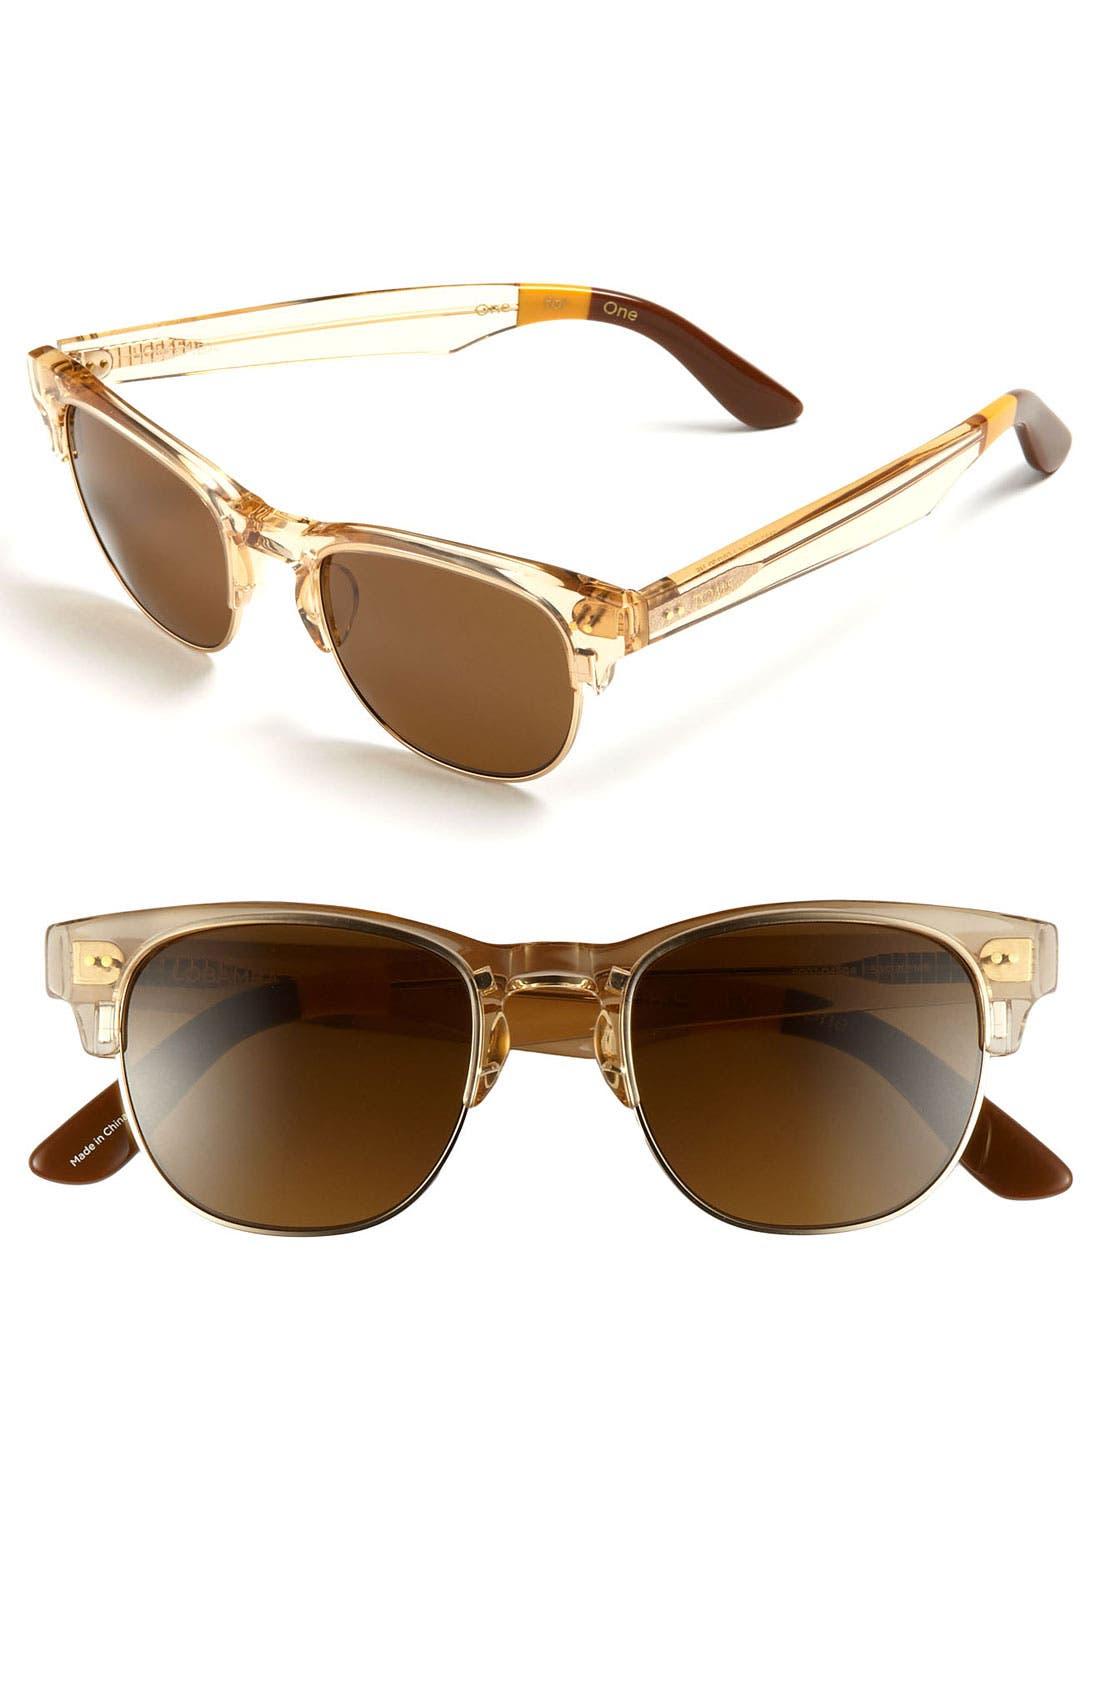 Alternate Image 1 Selected - TOMS 'Modern' Retro 50mm Sunglasses